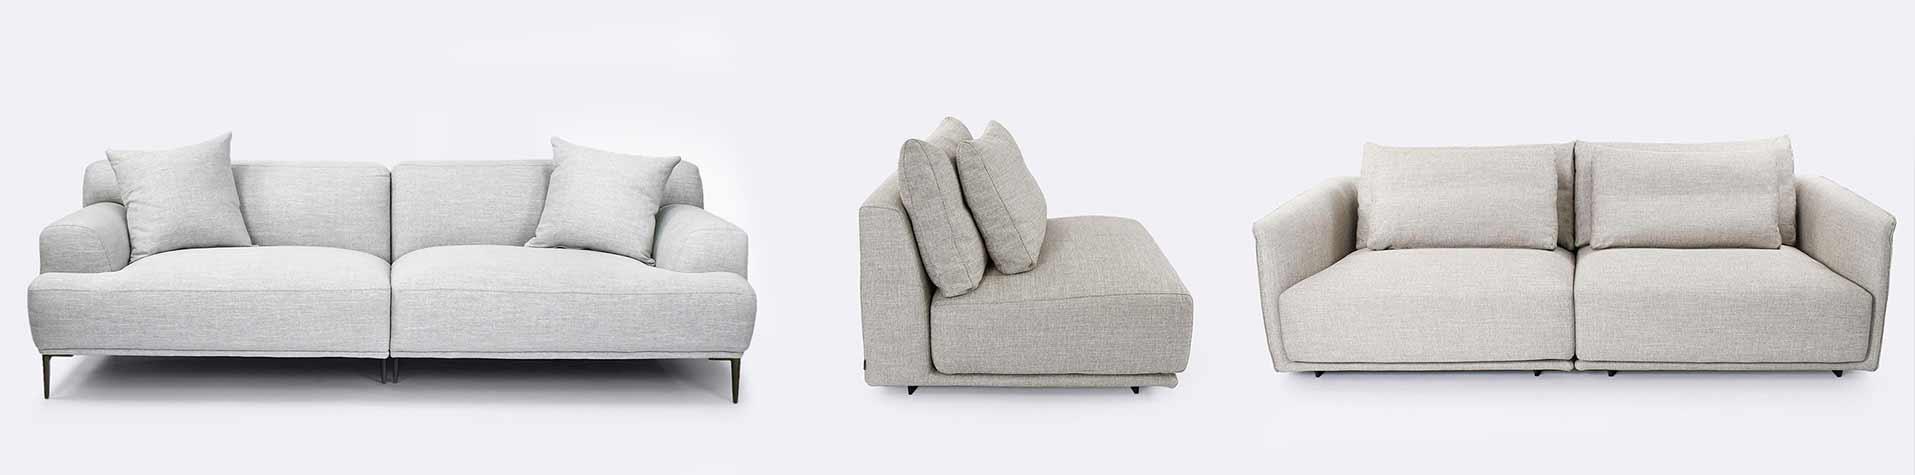 Sofas & Lounges Tallira Furniture